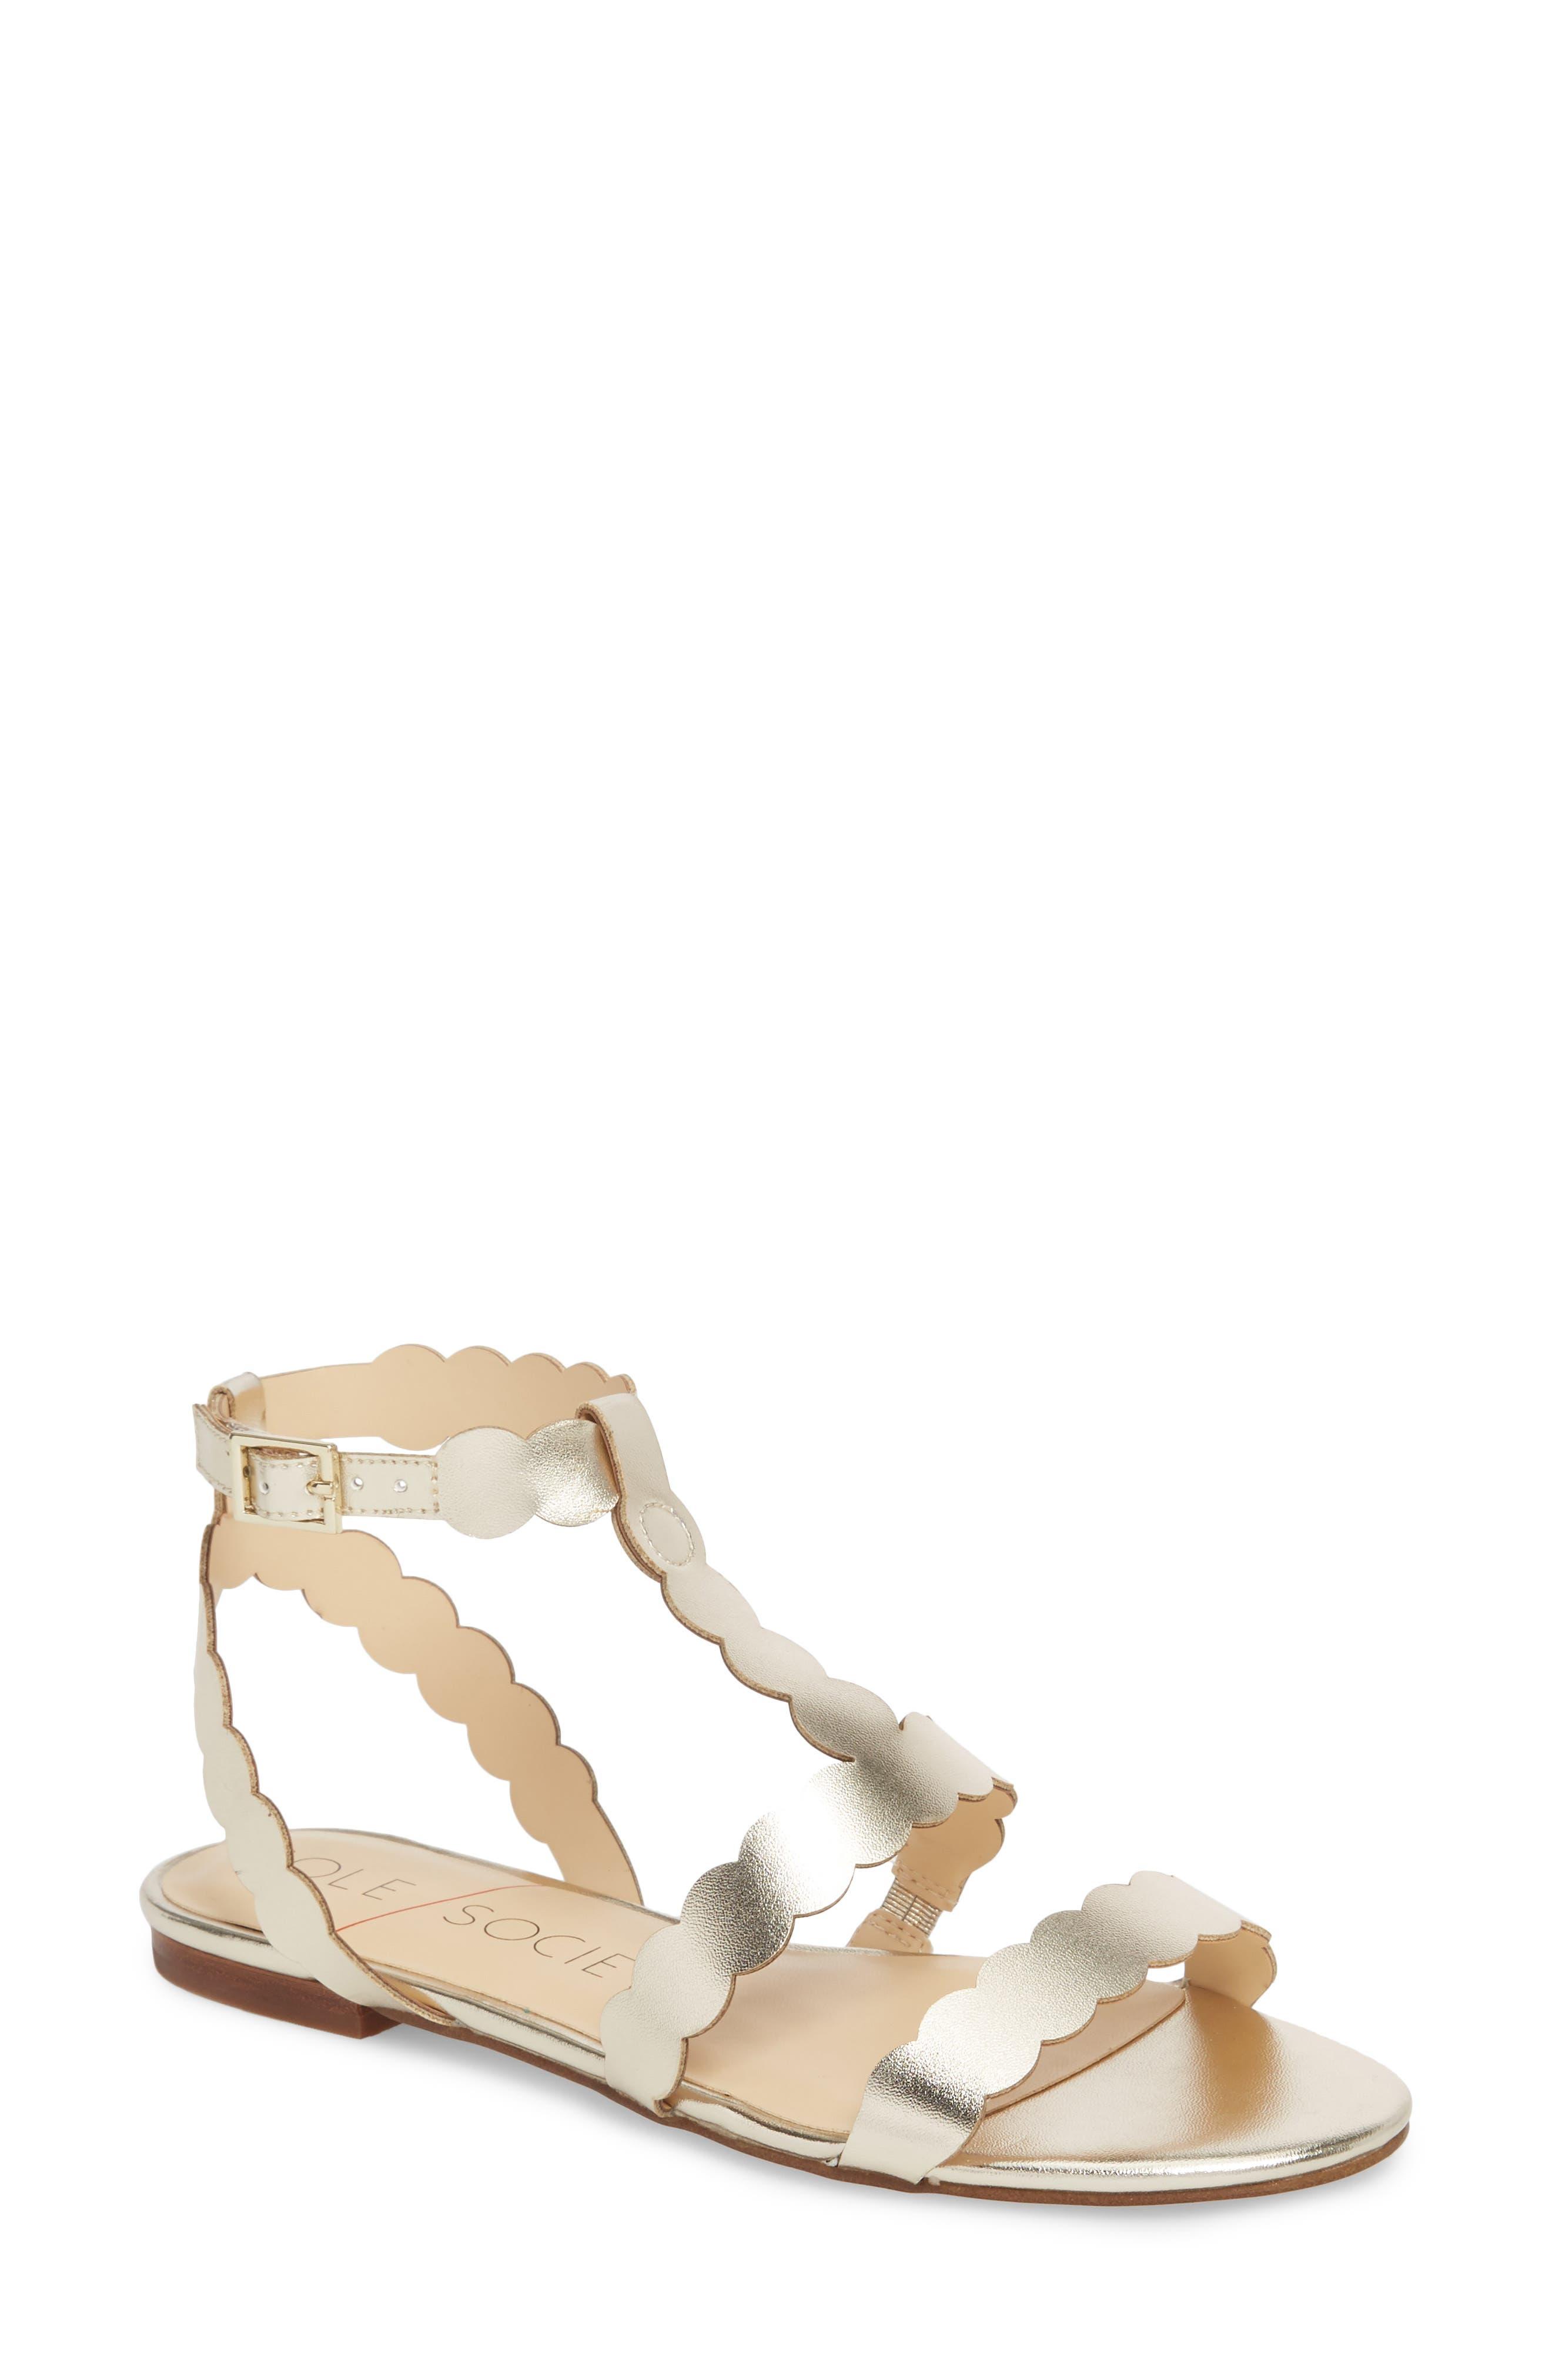 So-Maladee Flat Sandal,                         Main,                         color, Totes Gold